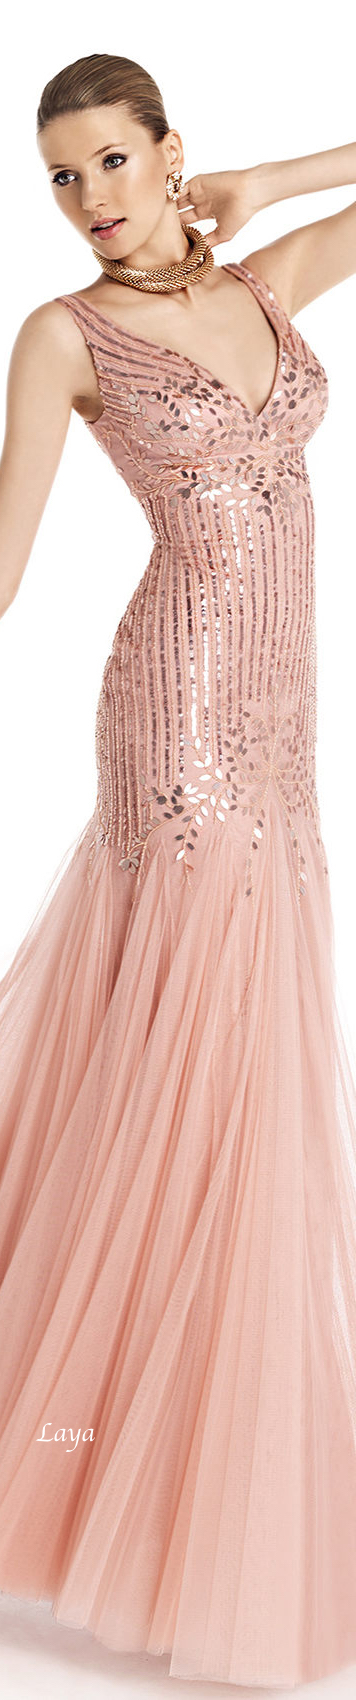 Pronovias Cocktail Dress 2014 | Playing Dress Up | Pinterest | Moda ...